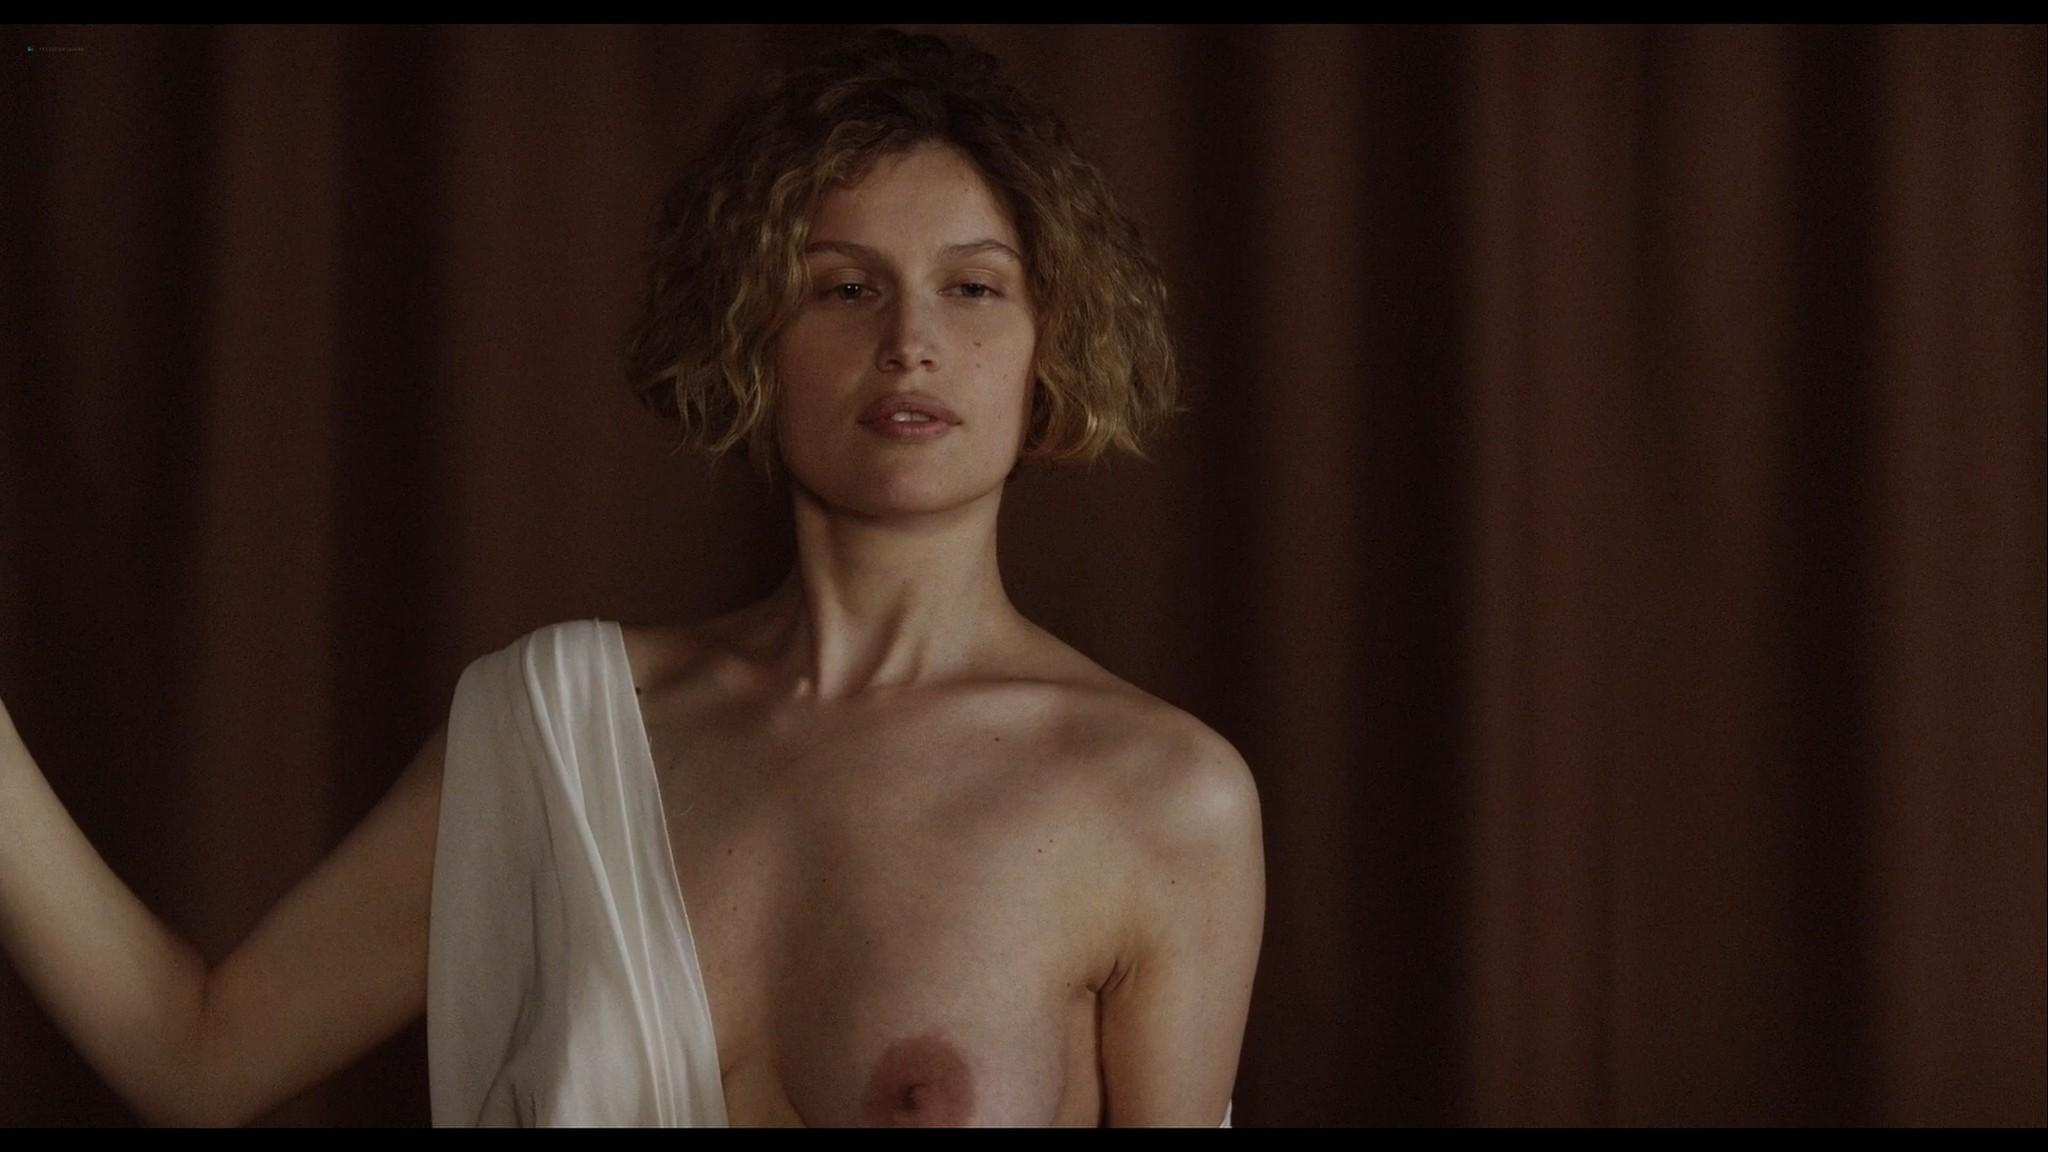 Laetitia Casta nude topless and very hot La jeune fille et les loups 2007 HD 1080p BluRay 5